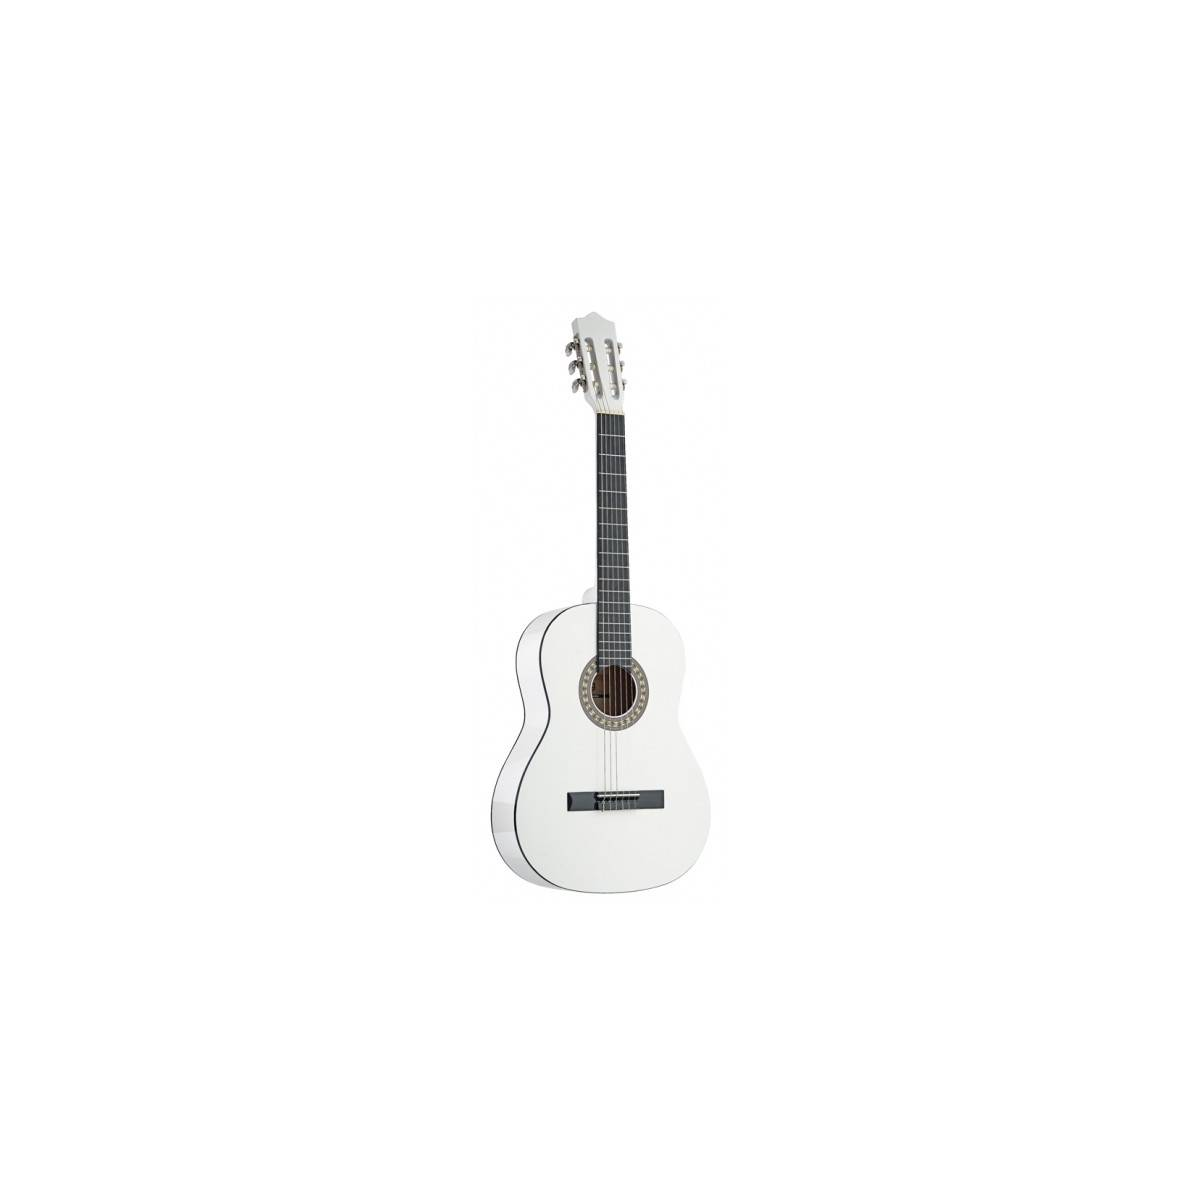 Guitare classique 4/4 tilleul blanc